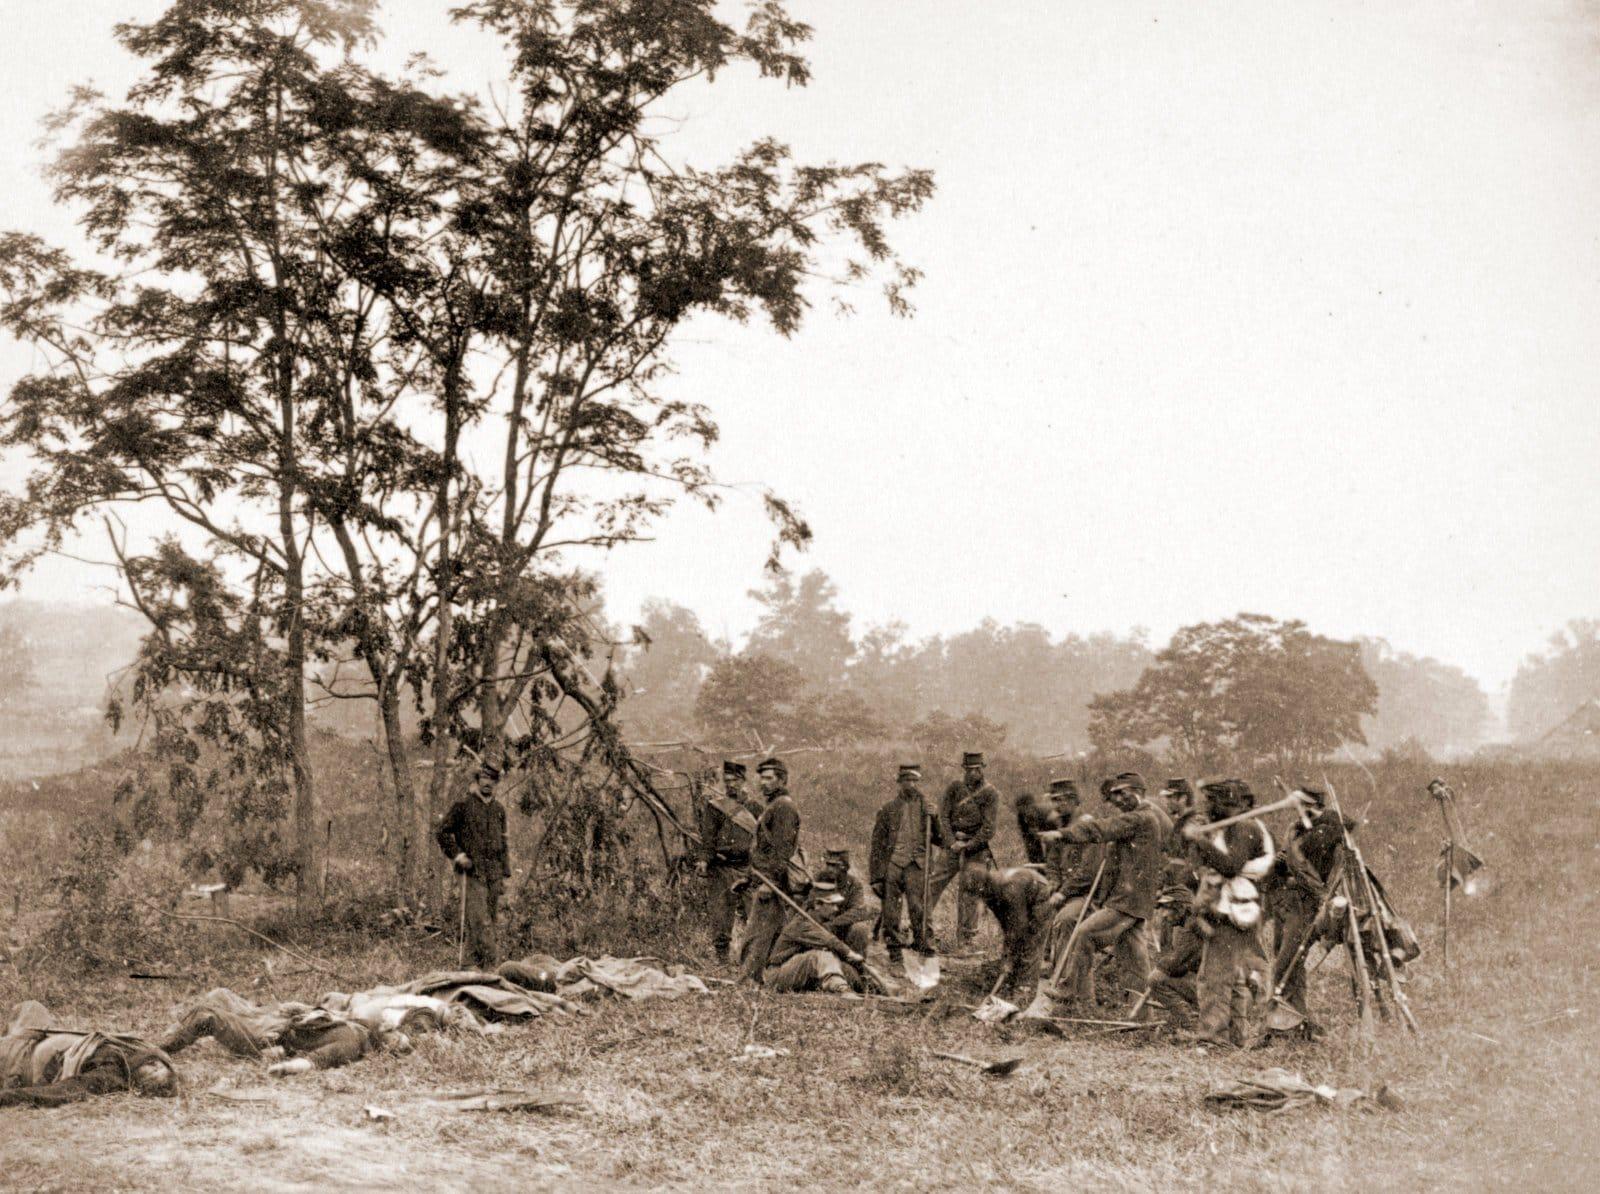 Burying the dead on the battlefield of Antietam